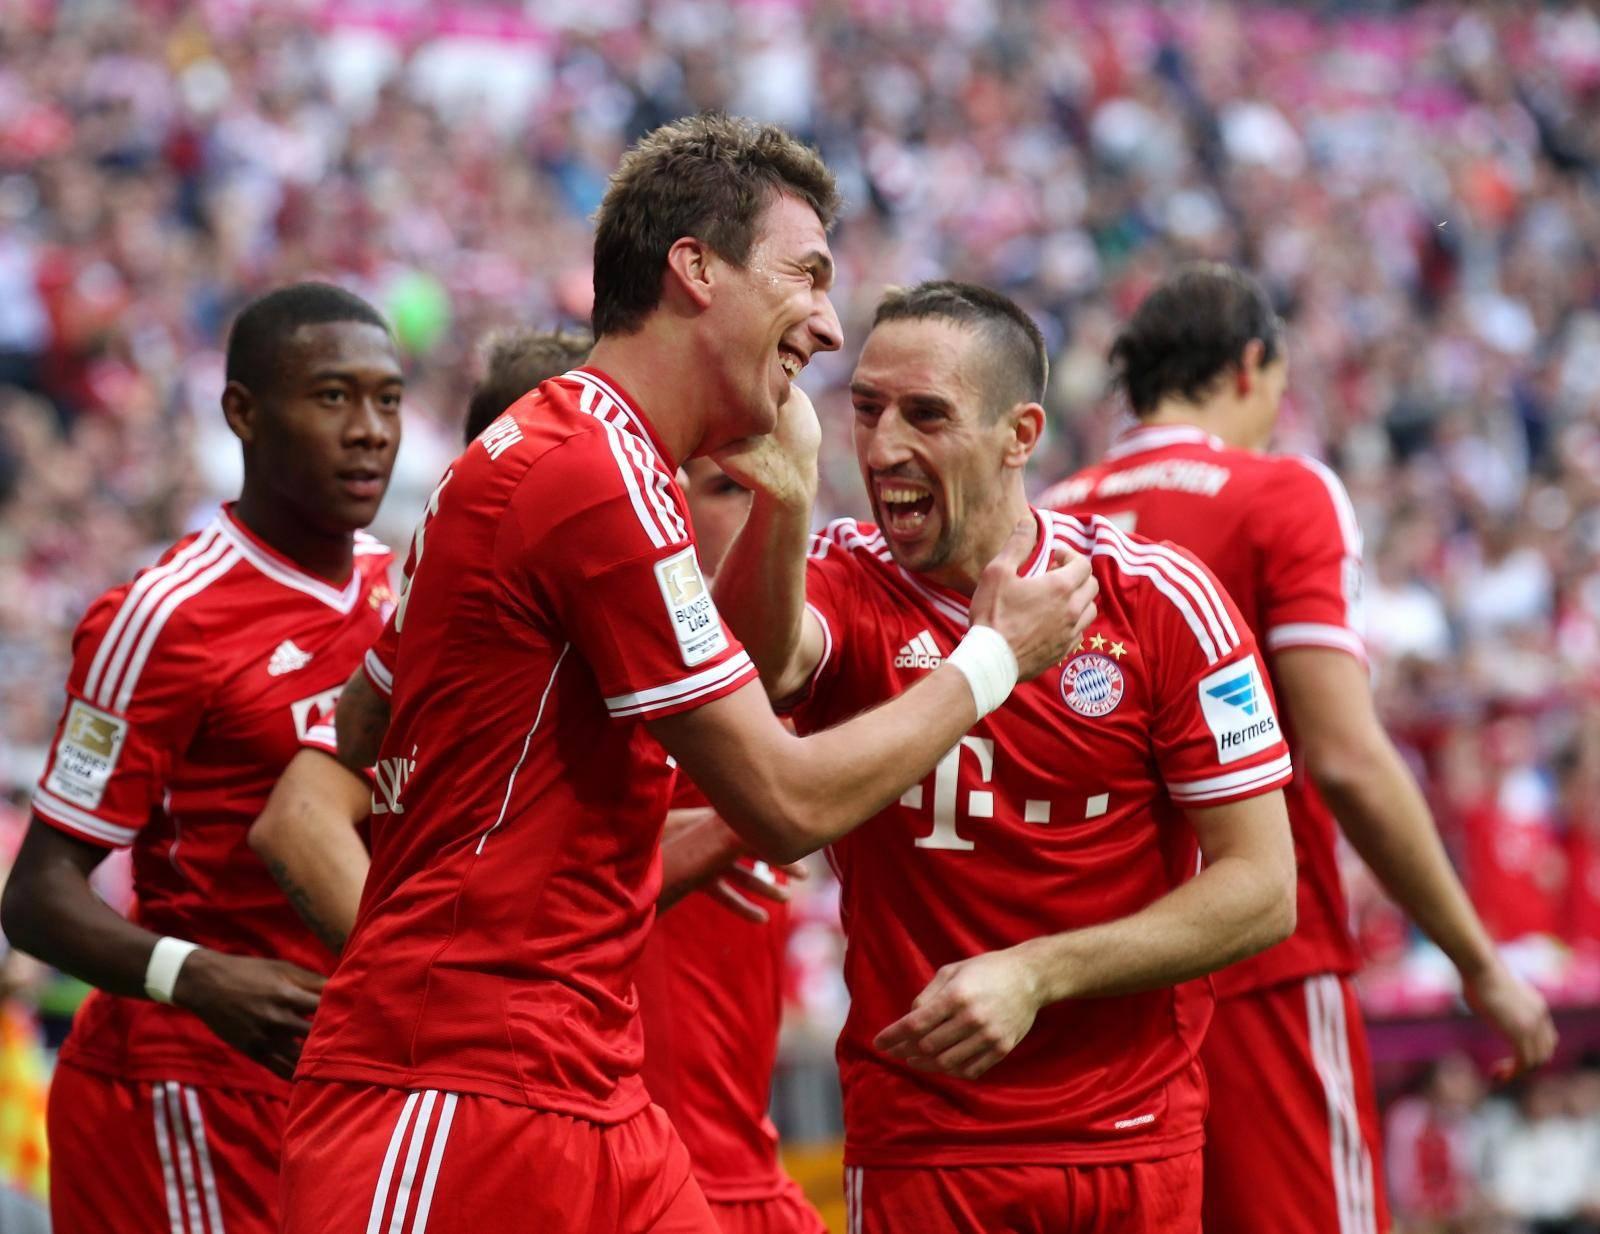 FC Bayern München vs. Hertha BSC Berlin